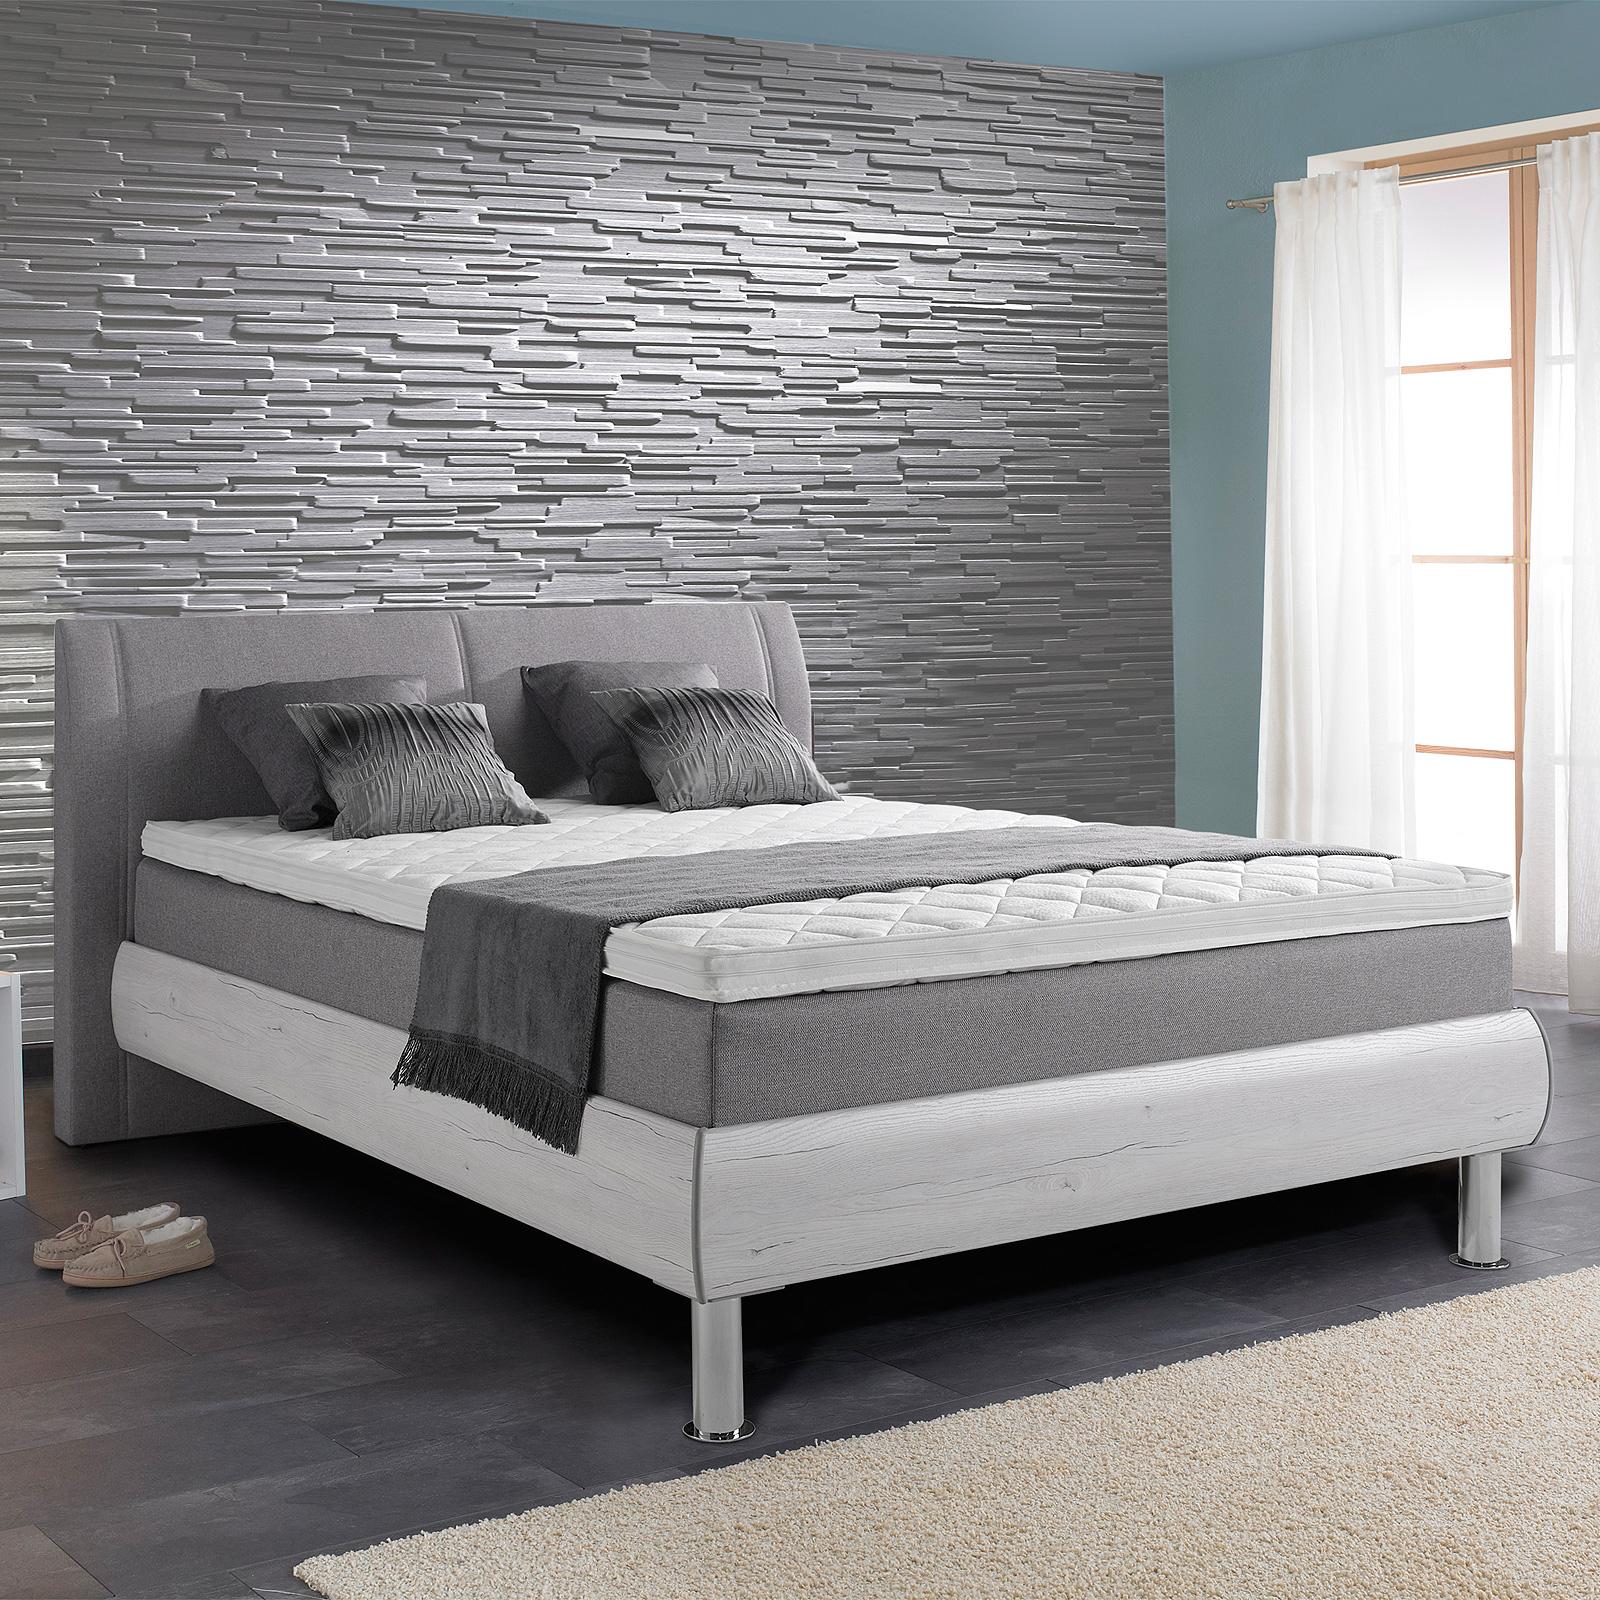 boxspringbett henning grau und san remo eiche wei inkl topper 140x200 cm ebay. Black Bedroom Furniture Sets. Home Design Ideas